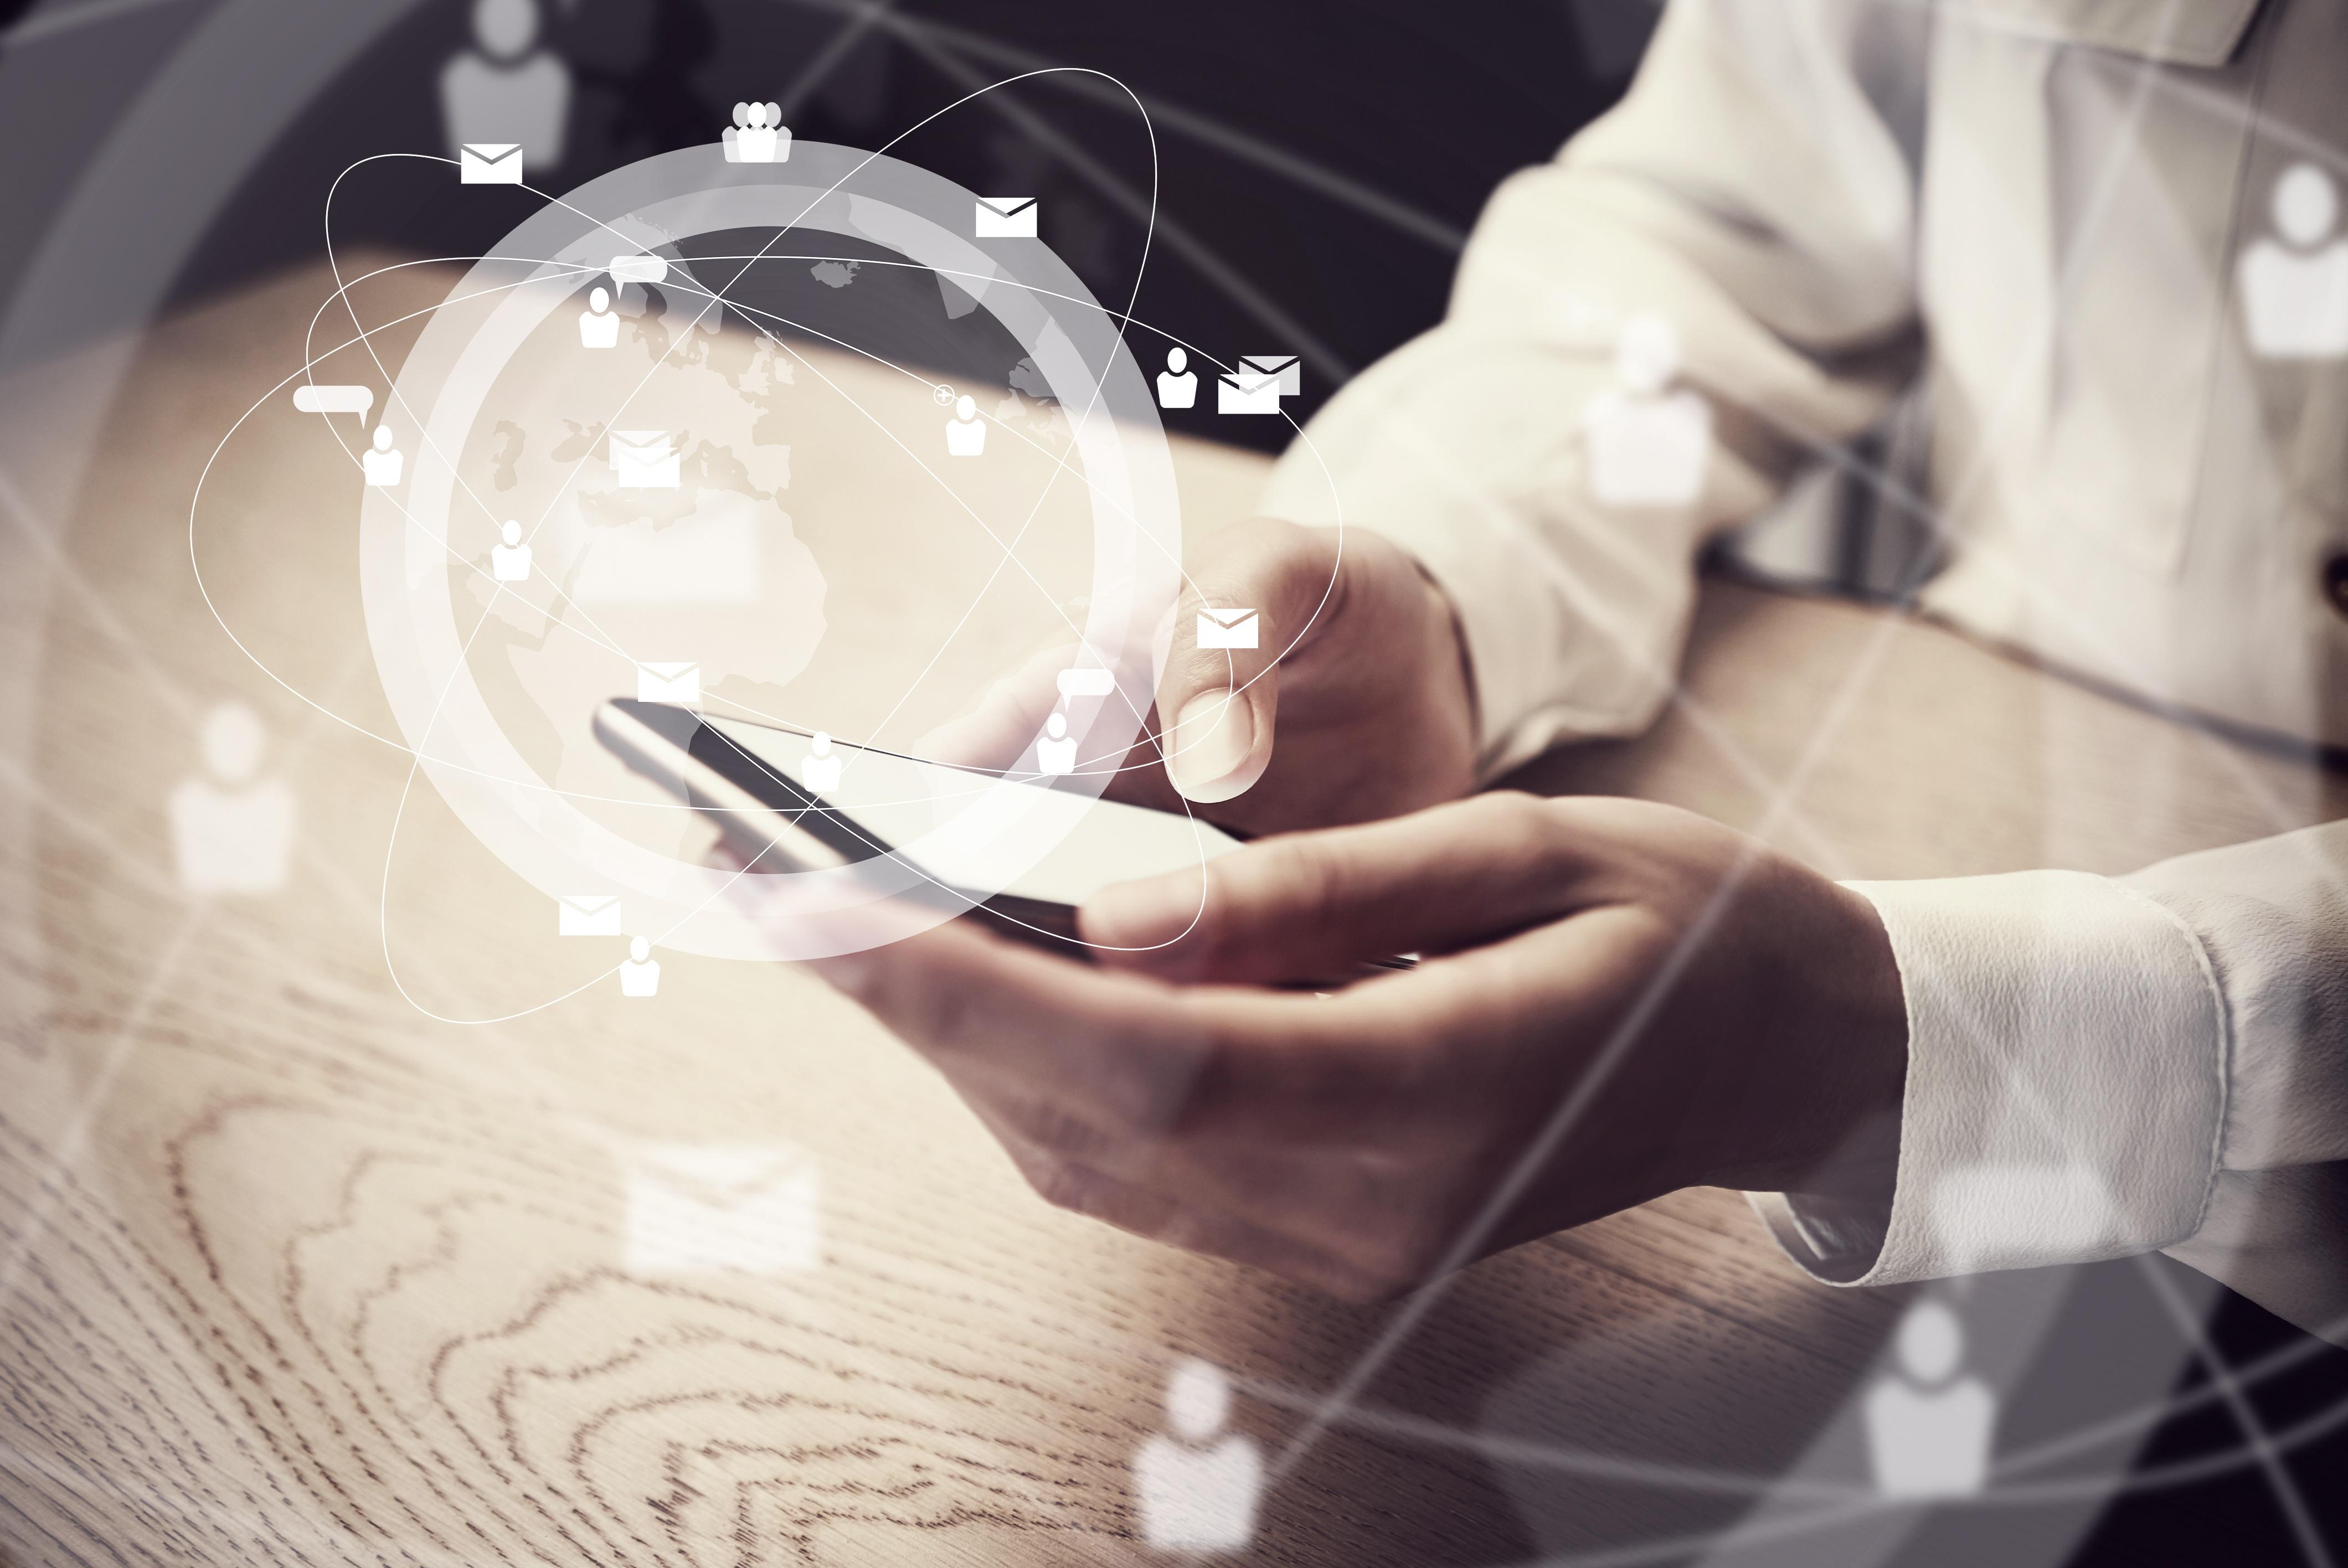 Generic-design-smartphone-holding-in-female-hands-texting--message.-Digital-511733570_4240x2832.jpeg